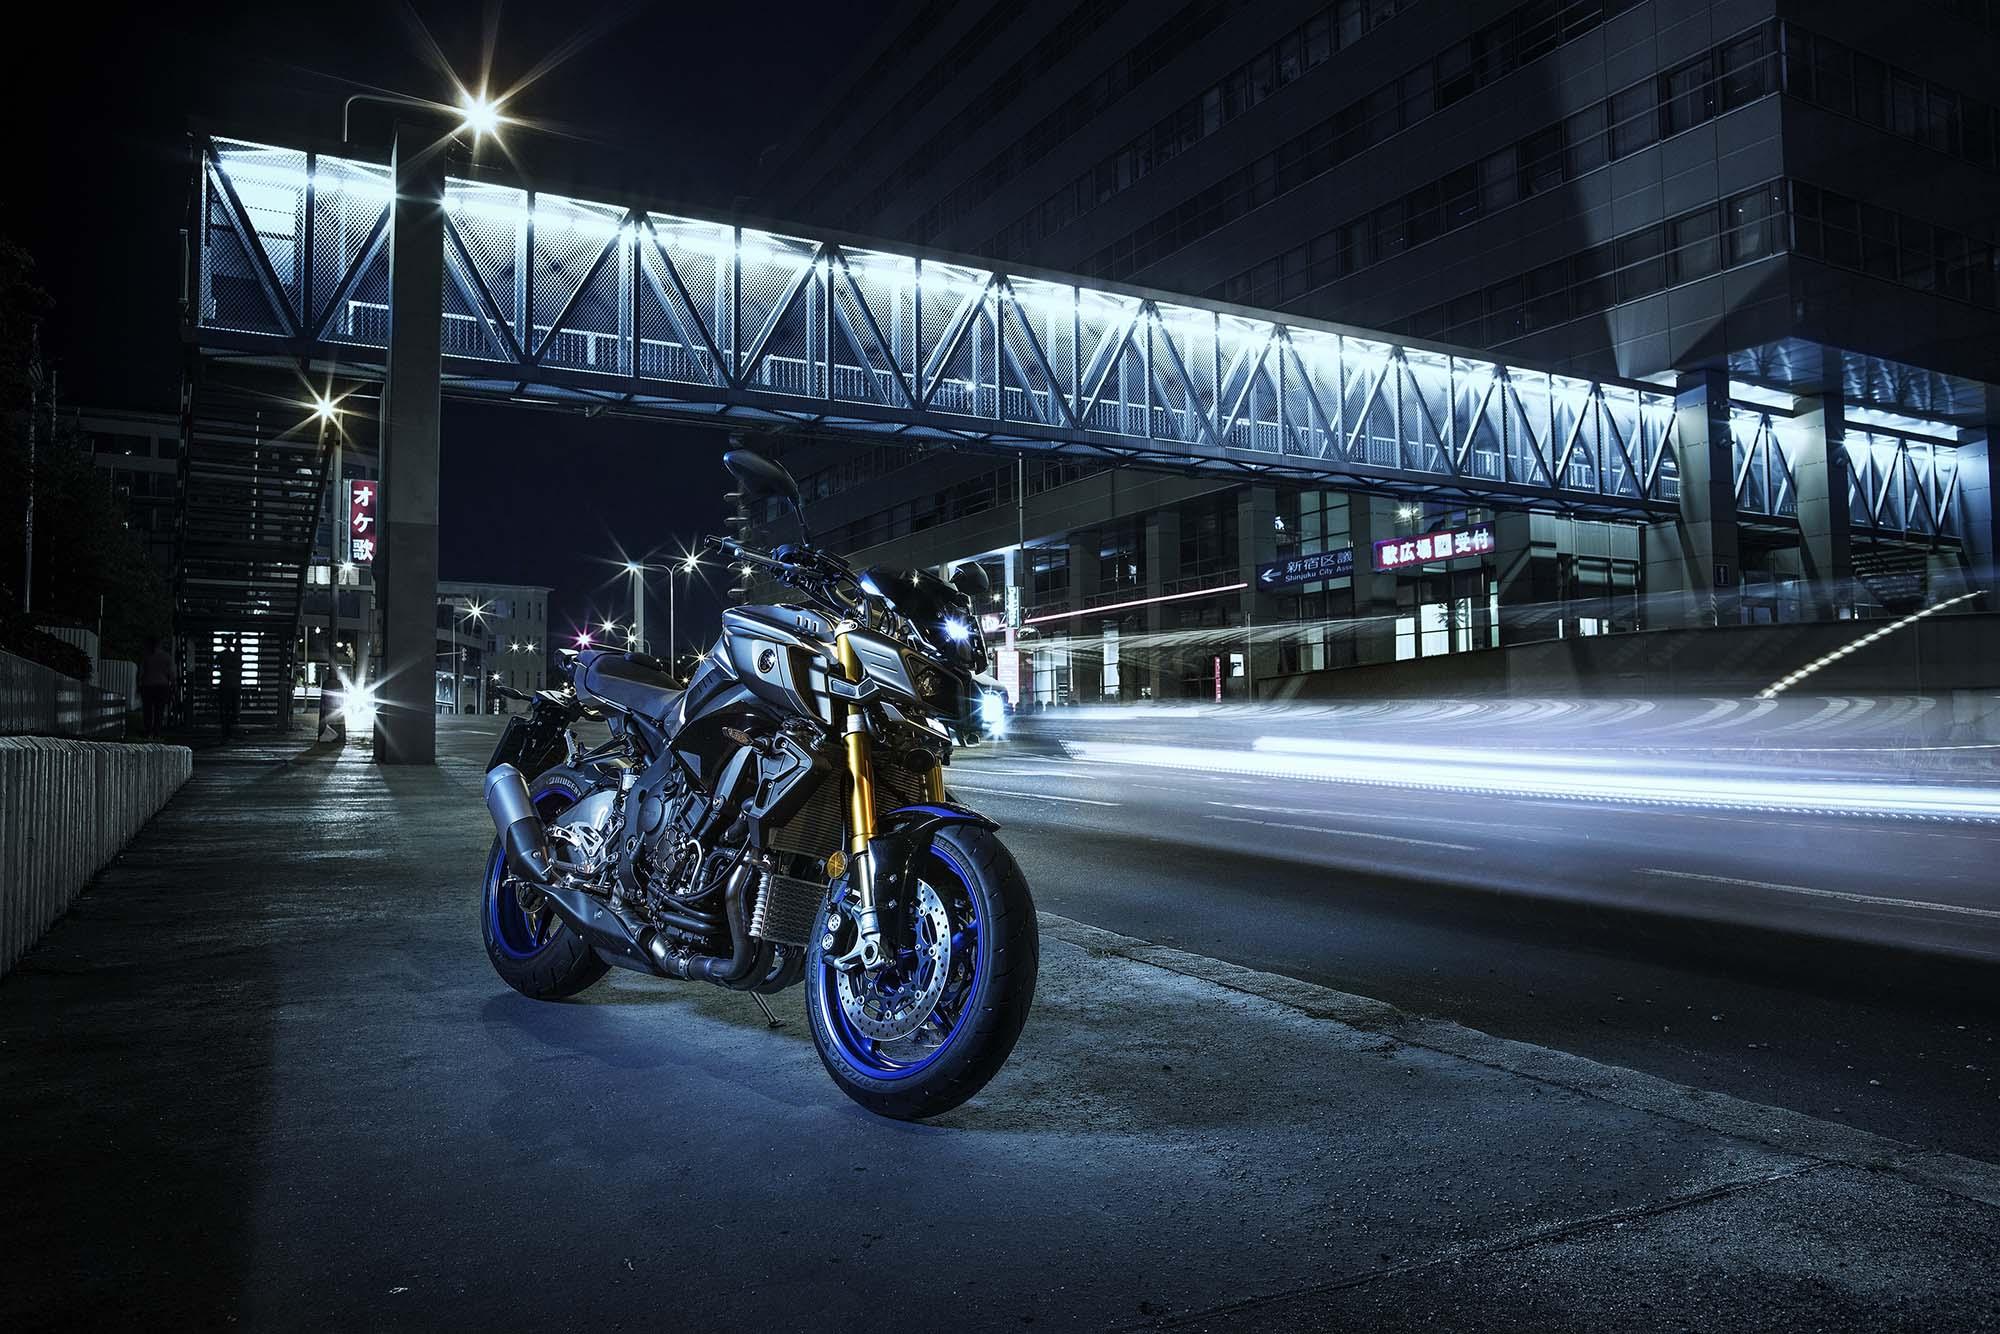 2017 Yamaha Mt 10 Sp Putting The Europeans On Notice